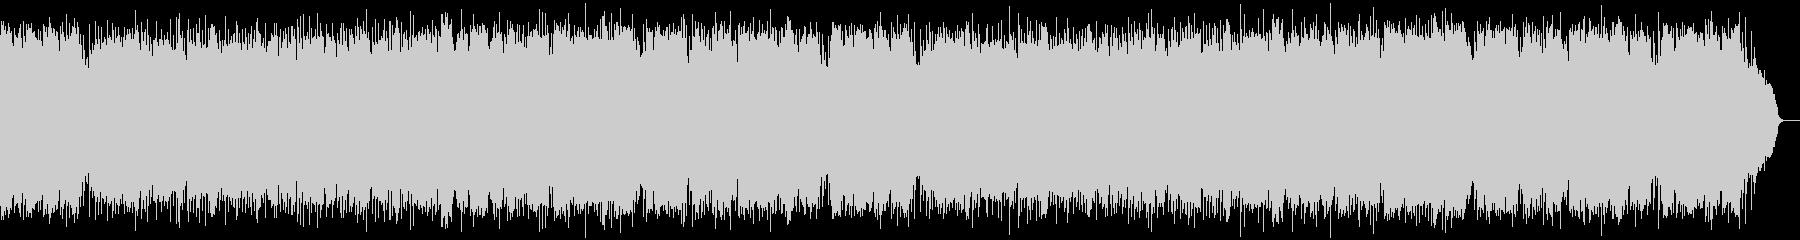 SAXが奏でるビギンのリズムの昭和歌謡の未再生の波形